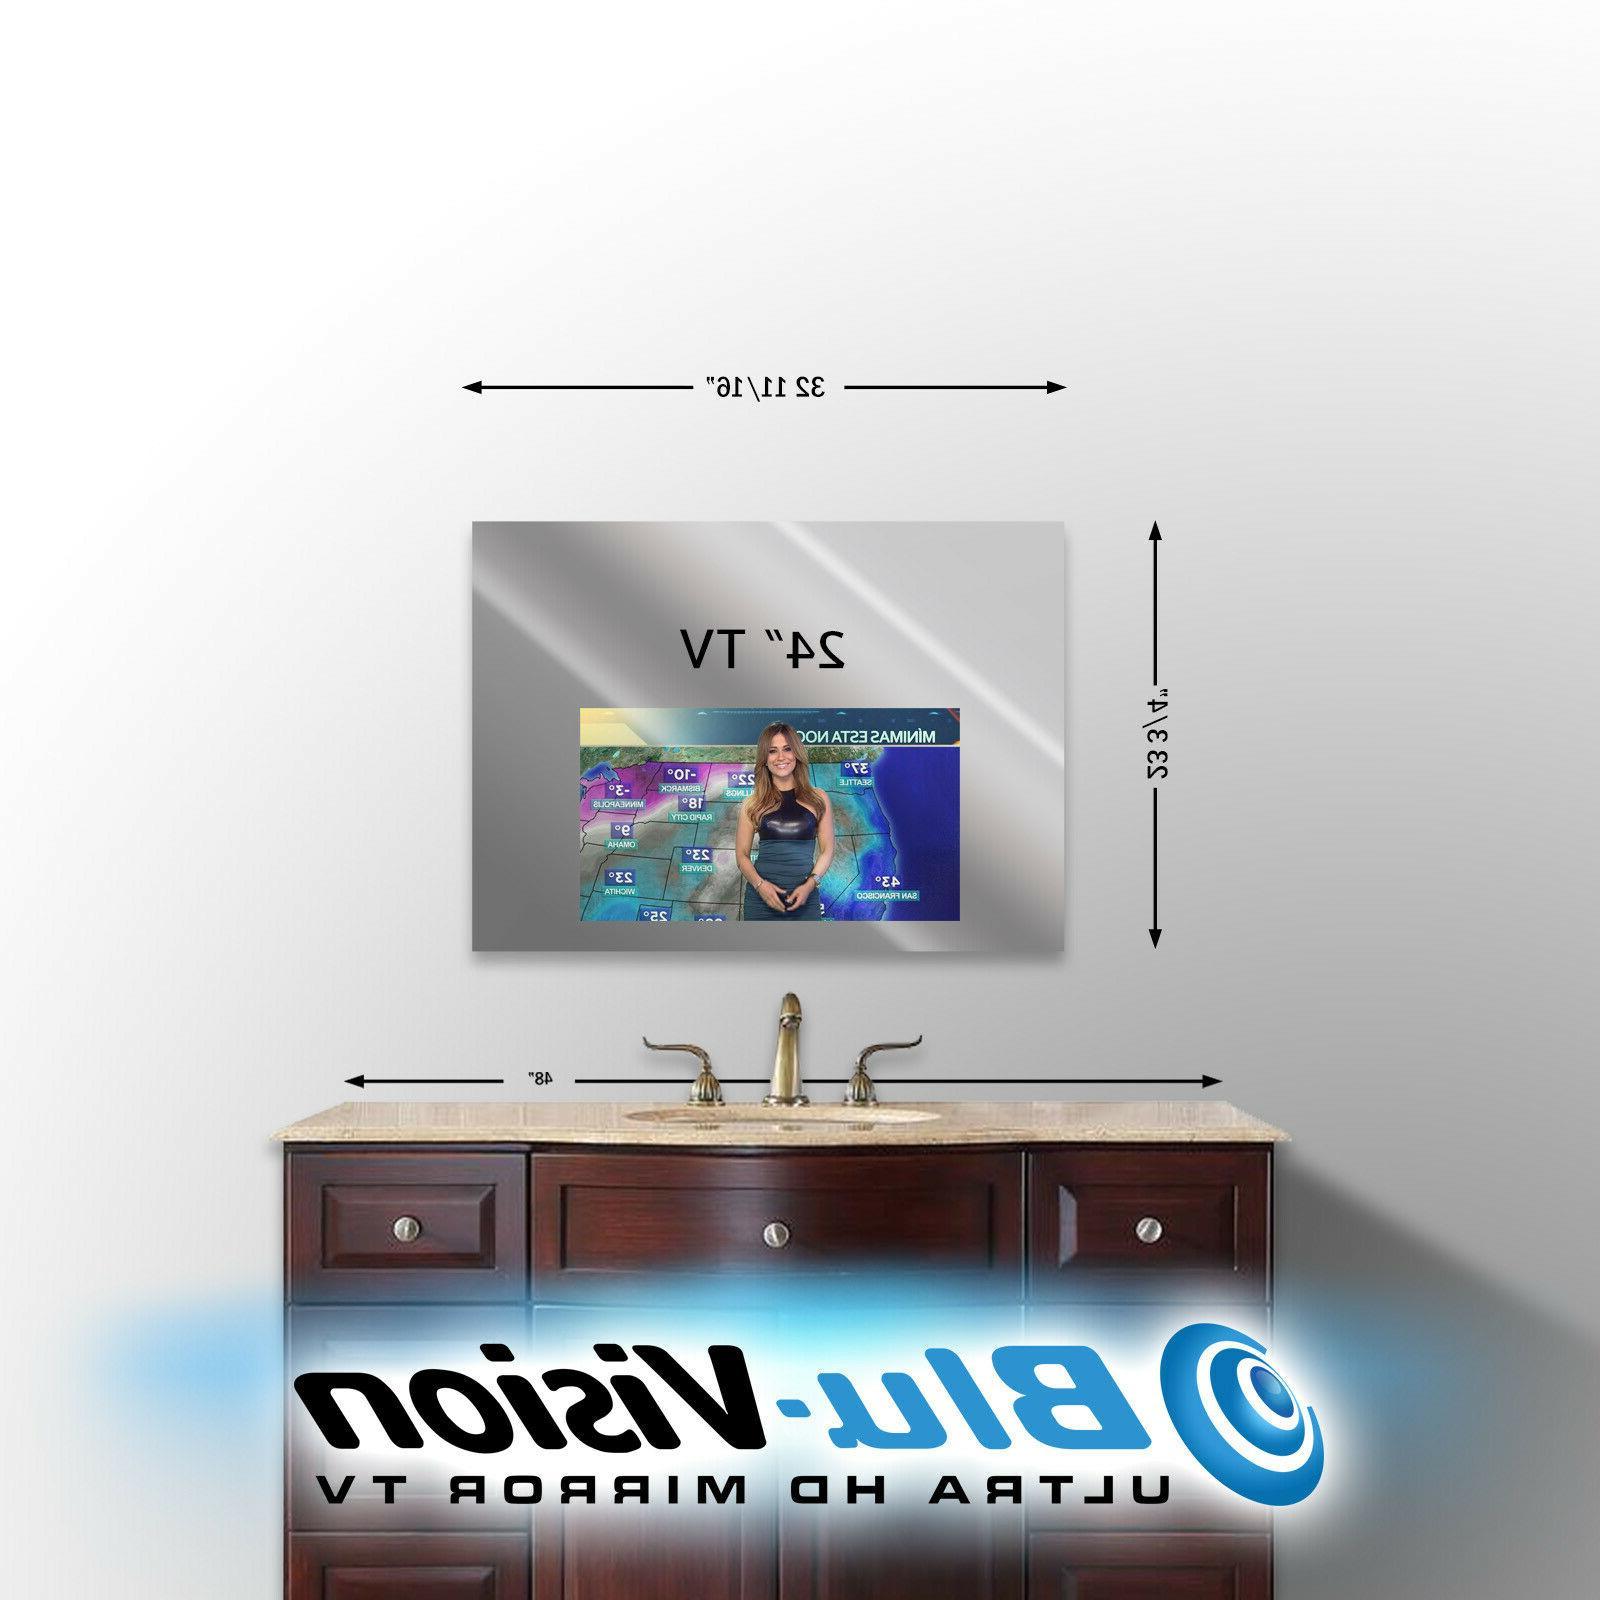 vanity mirror tv 24 class led smart